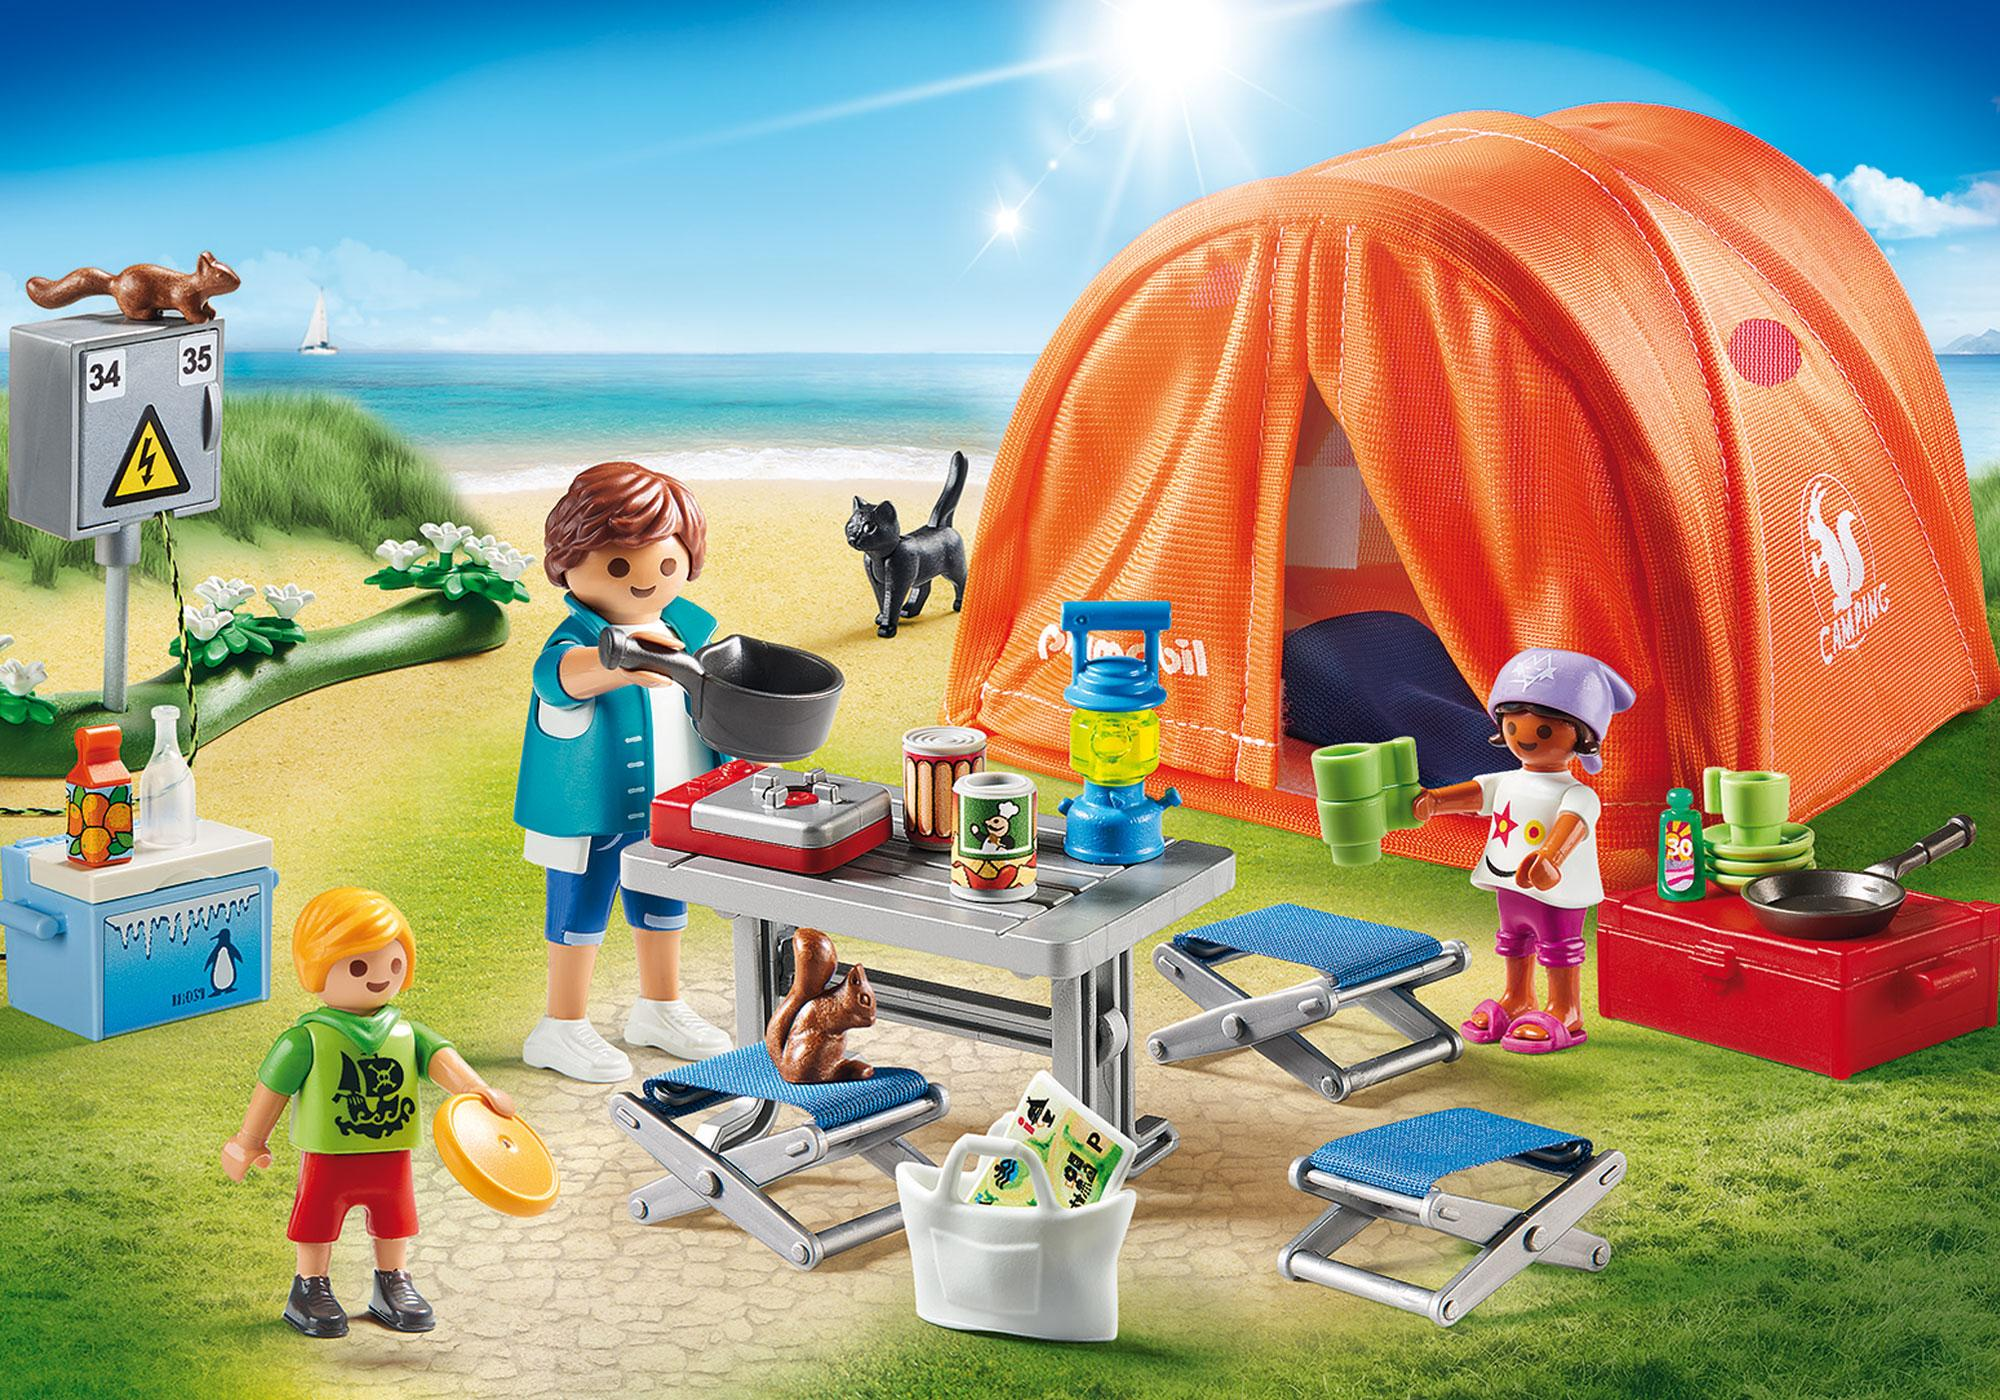 http://media.playmobil.com/i/playmobil/70089_product_detail/Campingferie med stort telt